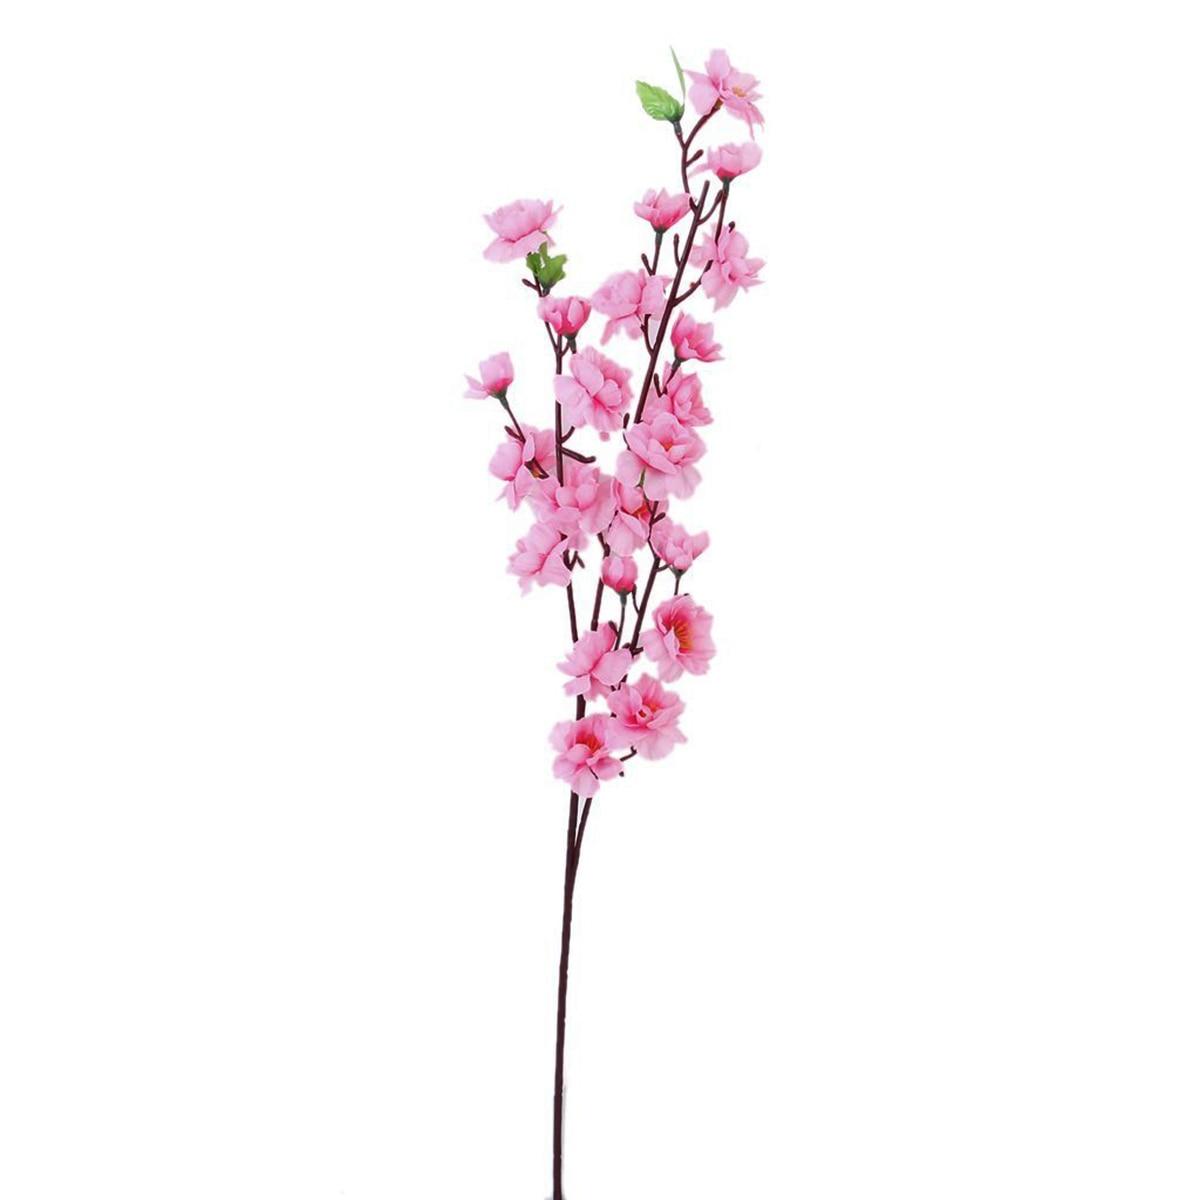 6st persika blomma simulering blommor konstgjorda blommor siden - Semester och fester - Foto 4